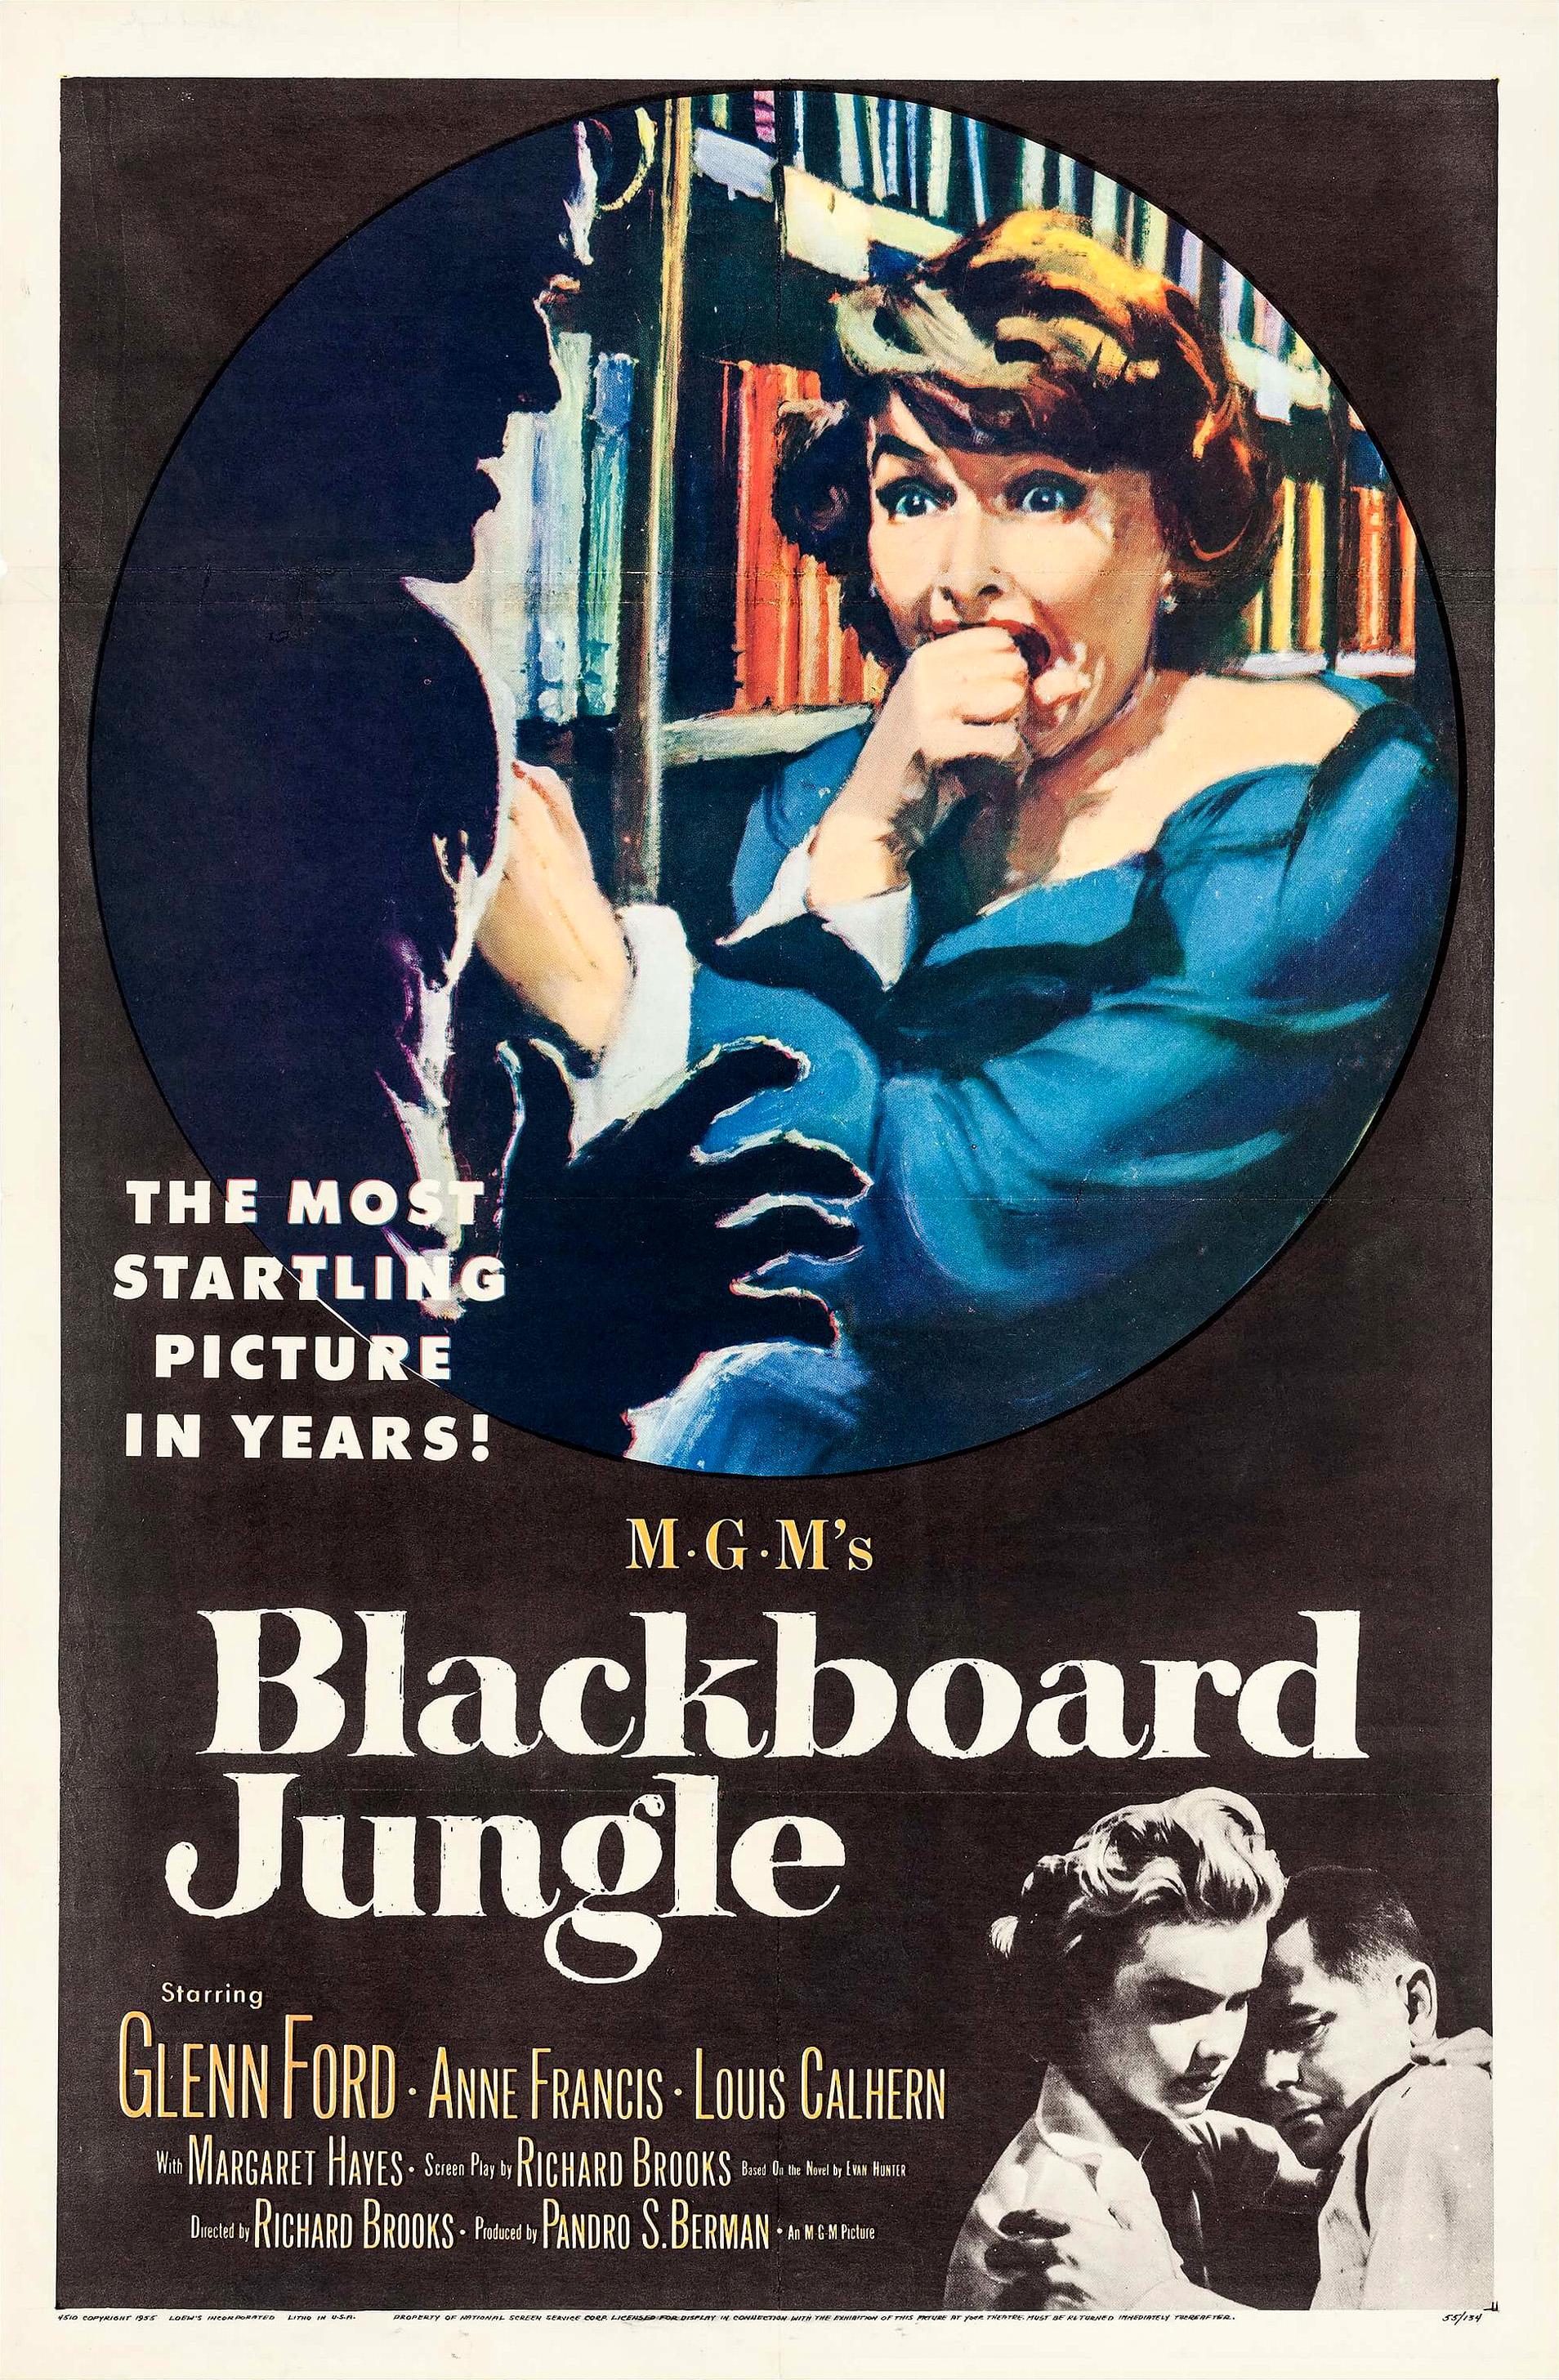 Blackboard Jungle - Wikipedia